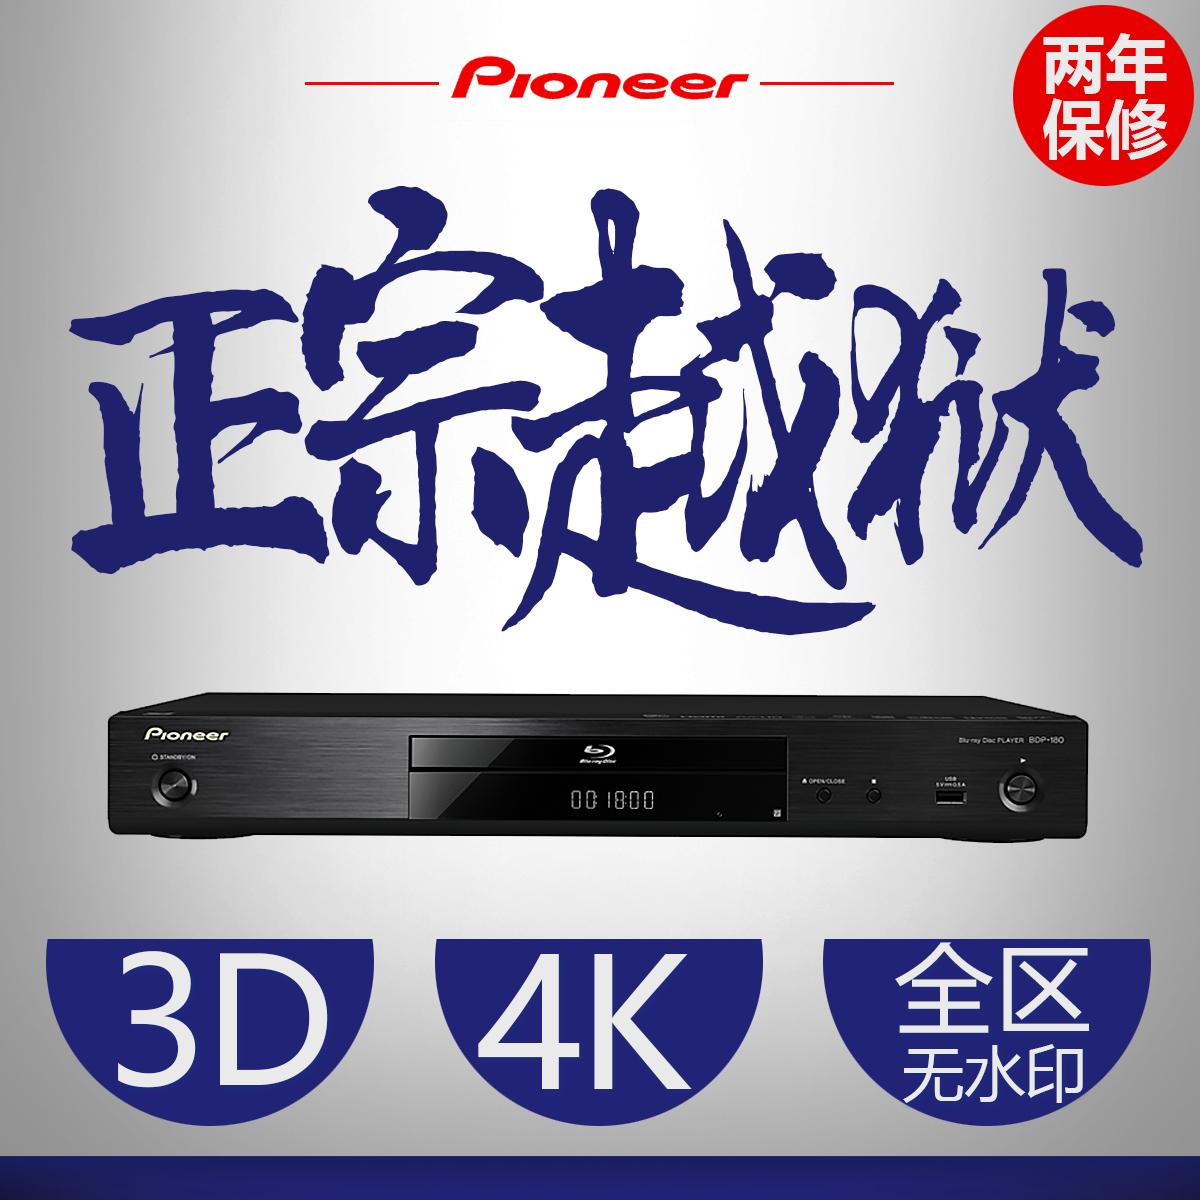 Pioneer先锋 蓝光DVD影碟机质量好吗,好